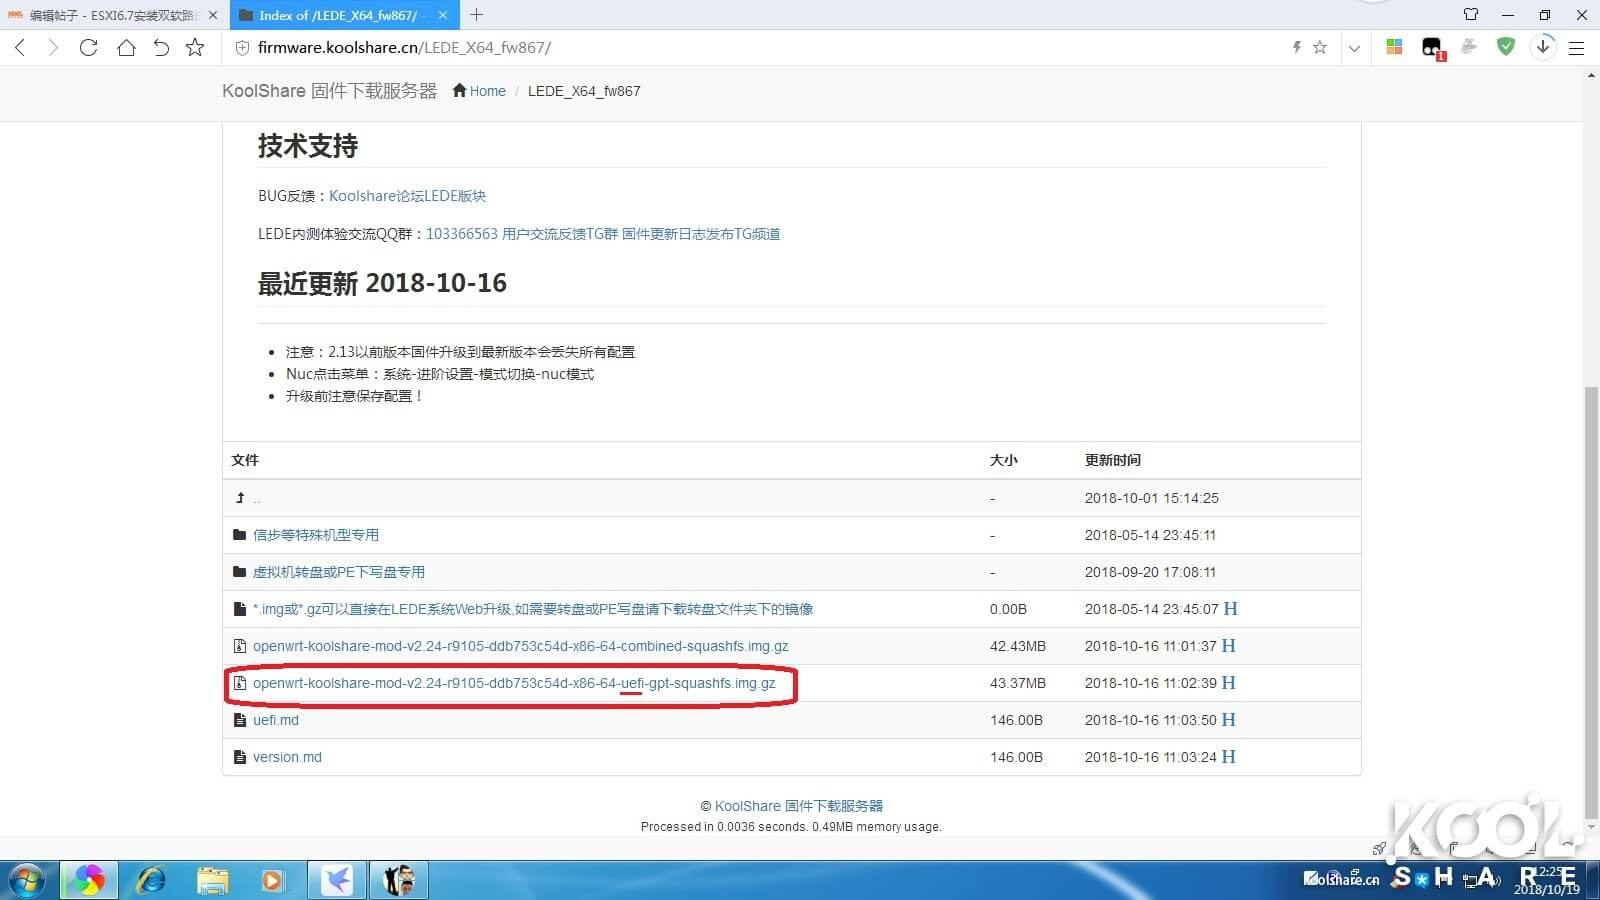 ESXI6.7安装双软路由iKuai+LEDE共存以及网卡直通